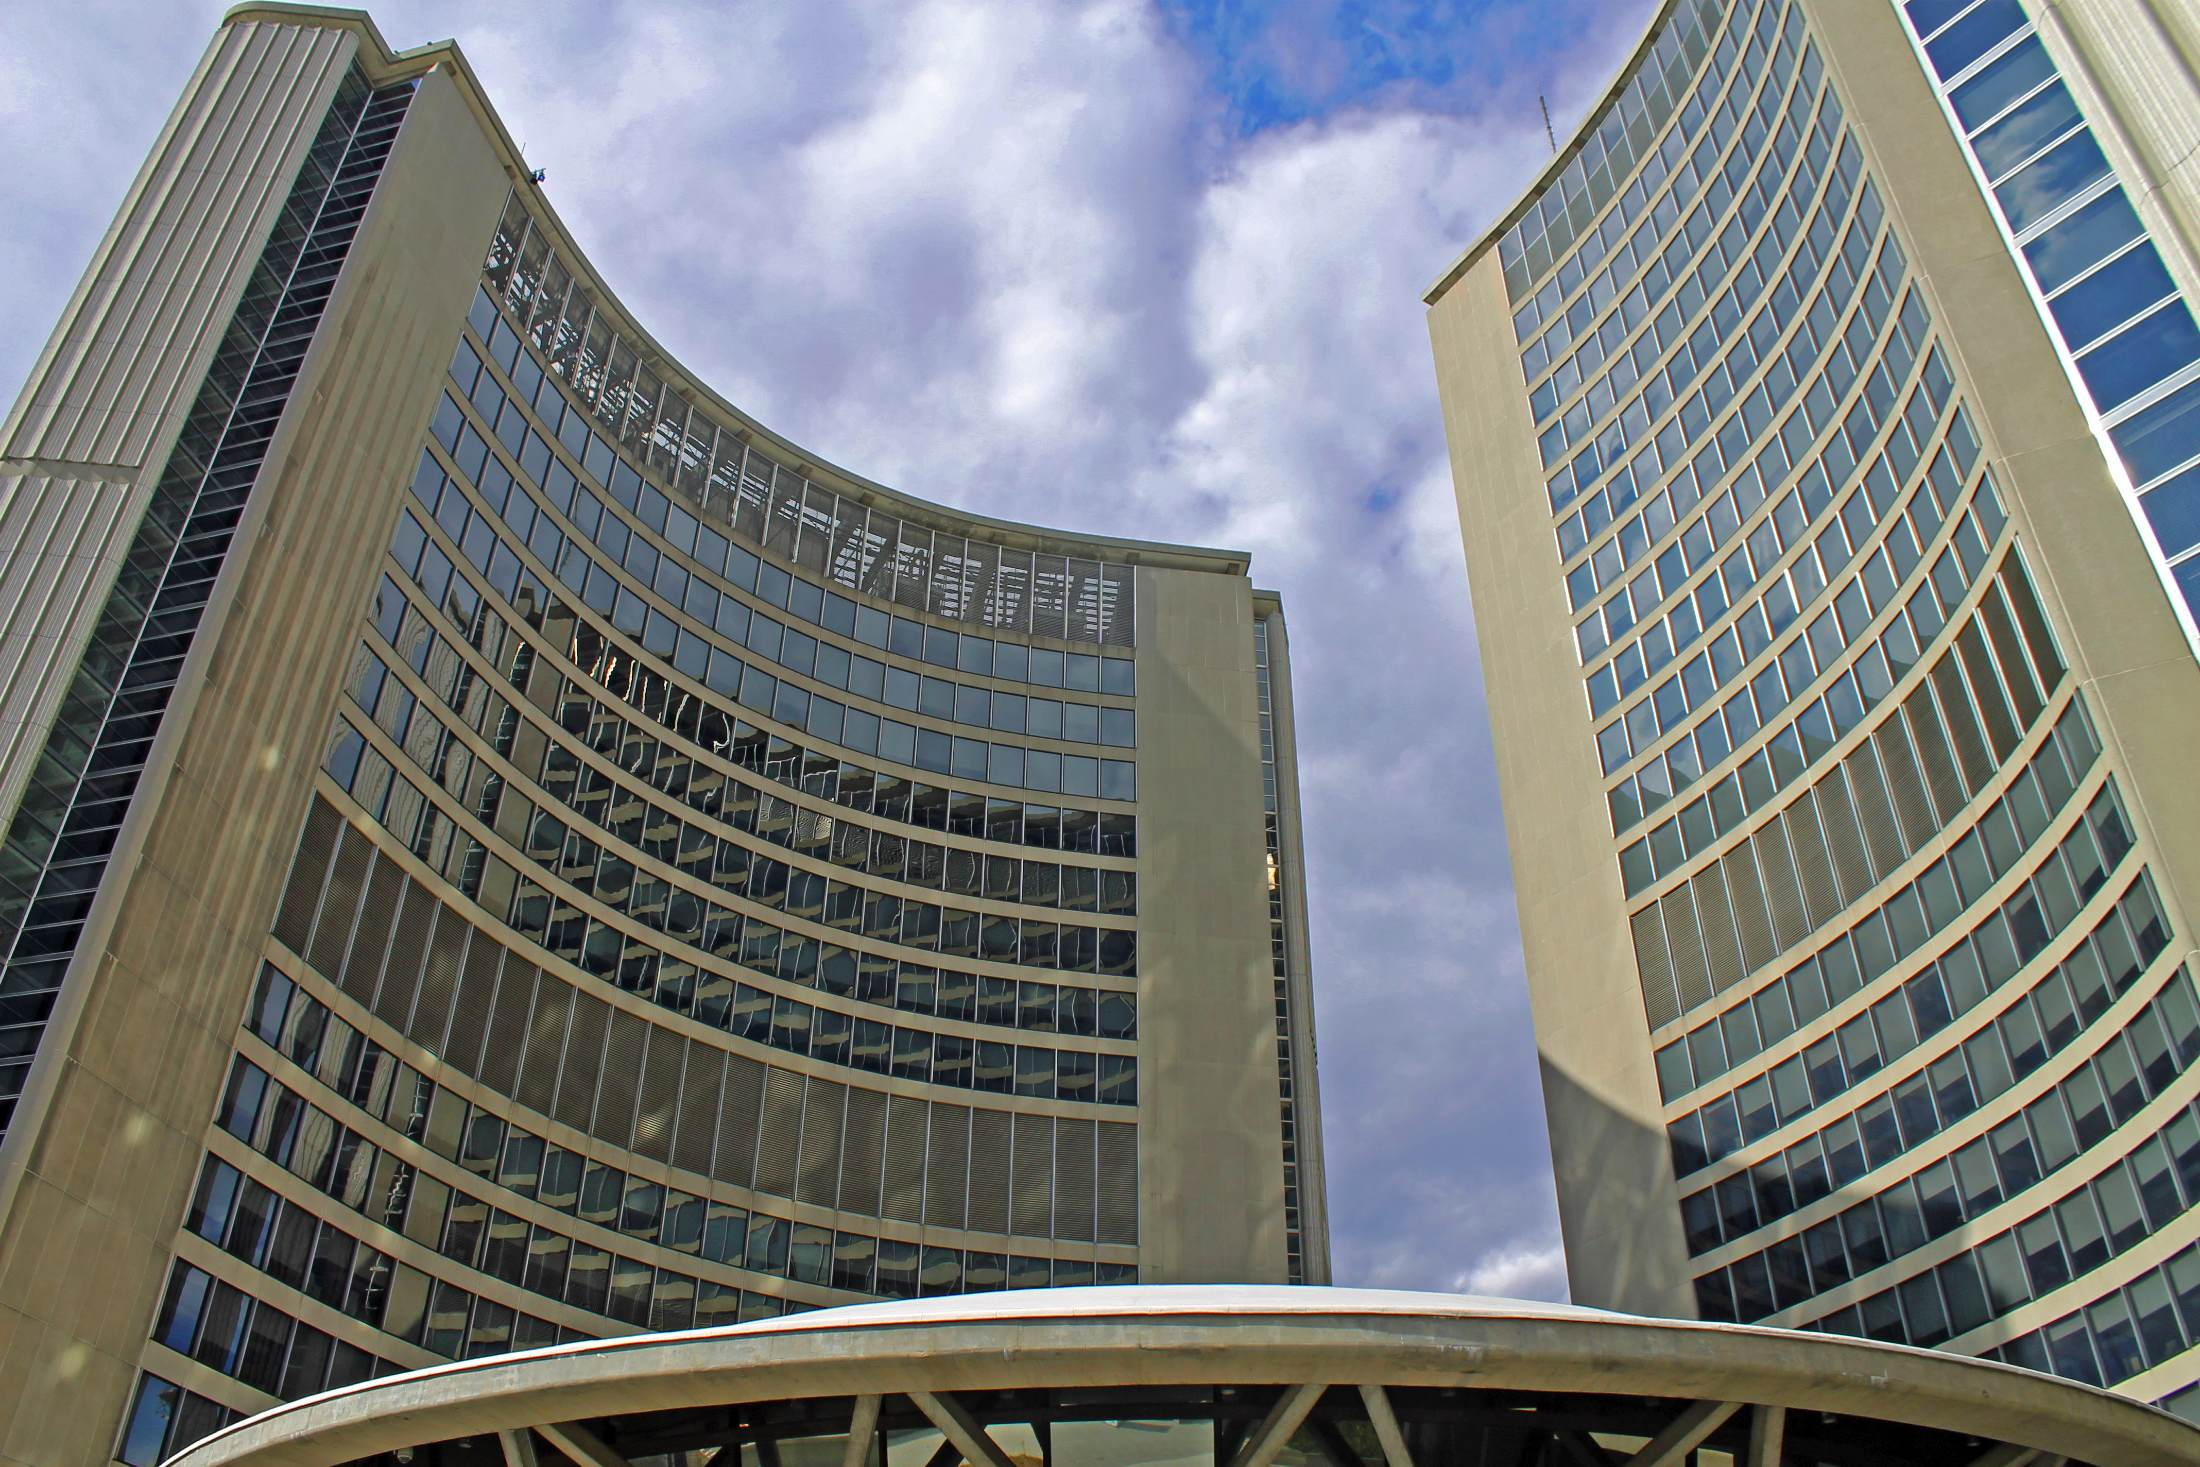 Toronto City Hall - Focal Journey